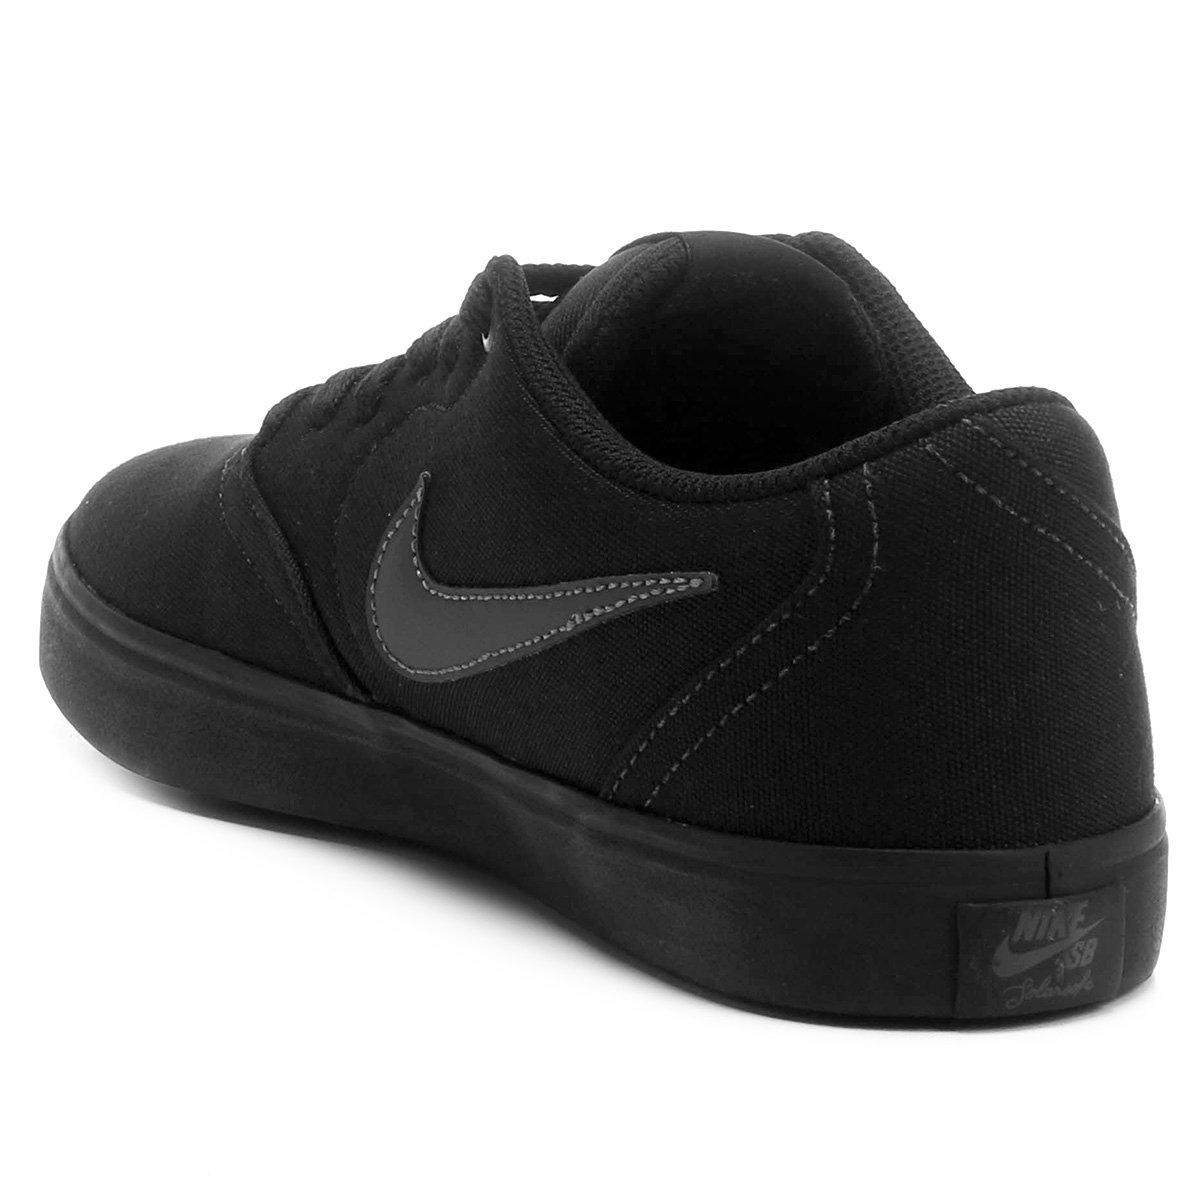 f2ec89a82bb Tênis Nike Sb Check Solar Cnvs Preto Masculino - Compre Agora ...